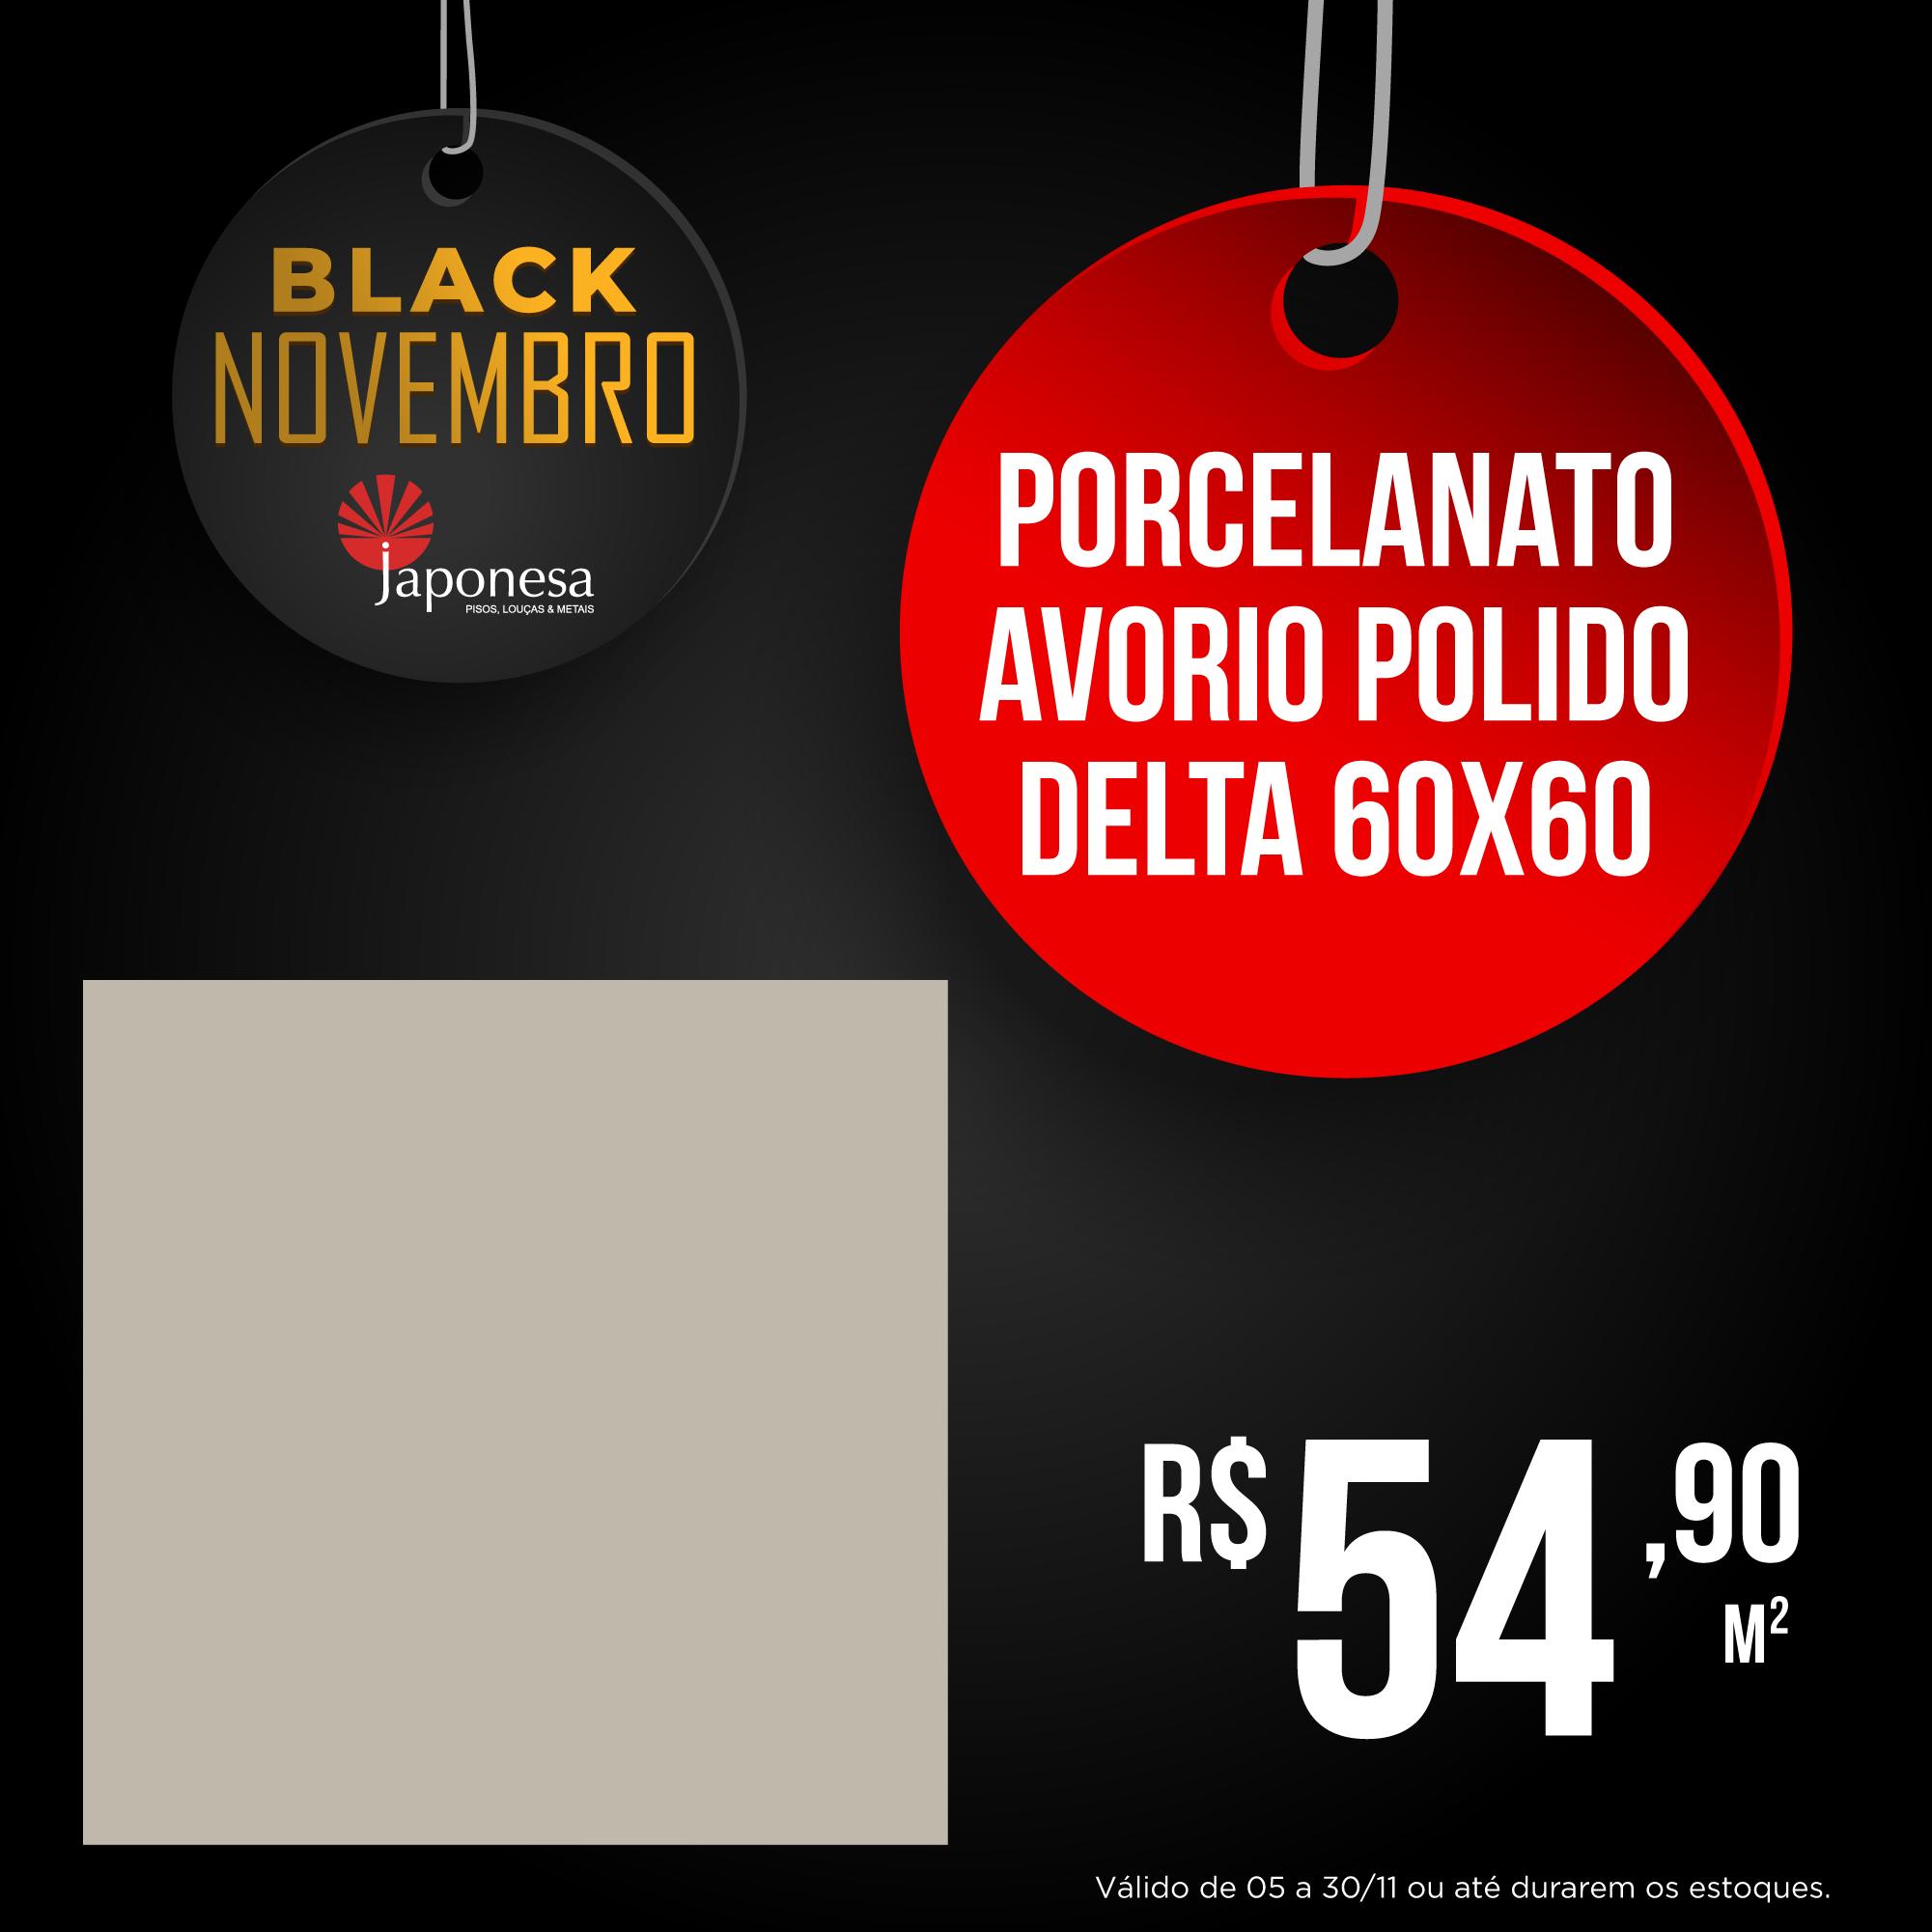 PORCELANATO AVORIO POLIDO DELTA 60X60